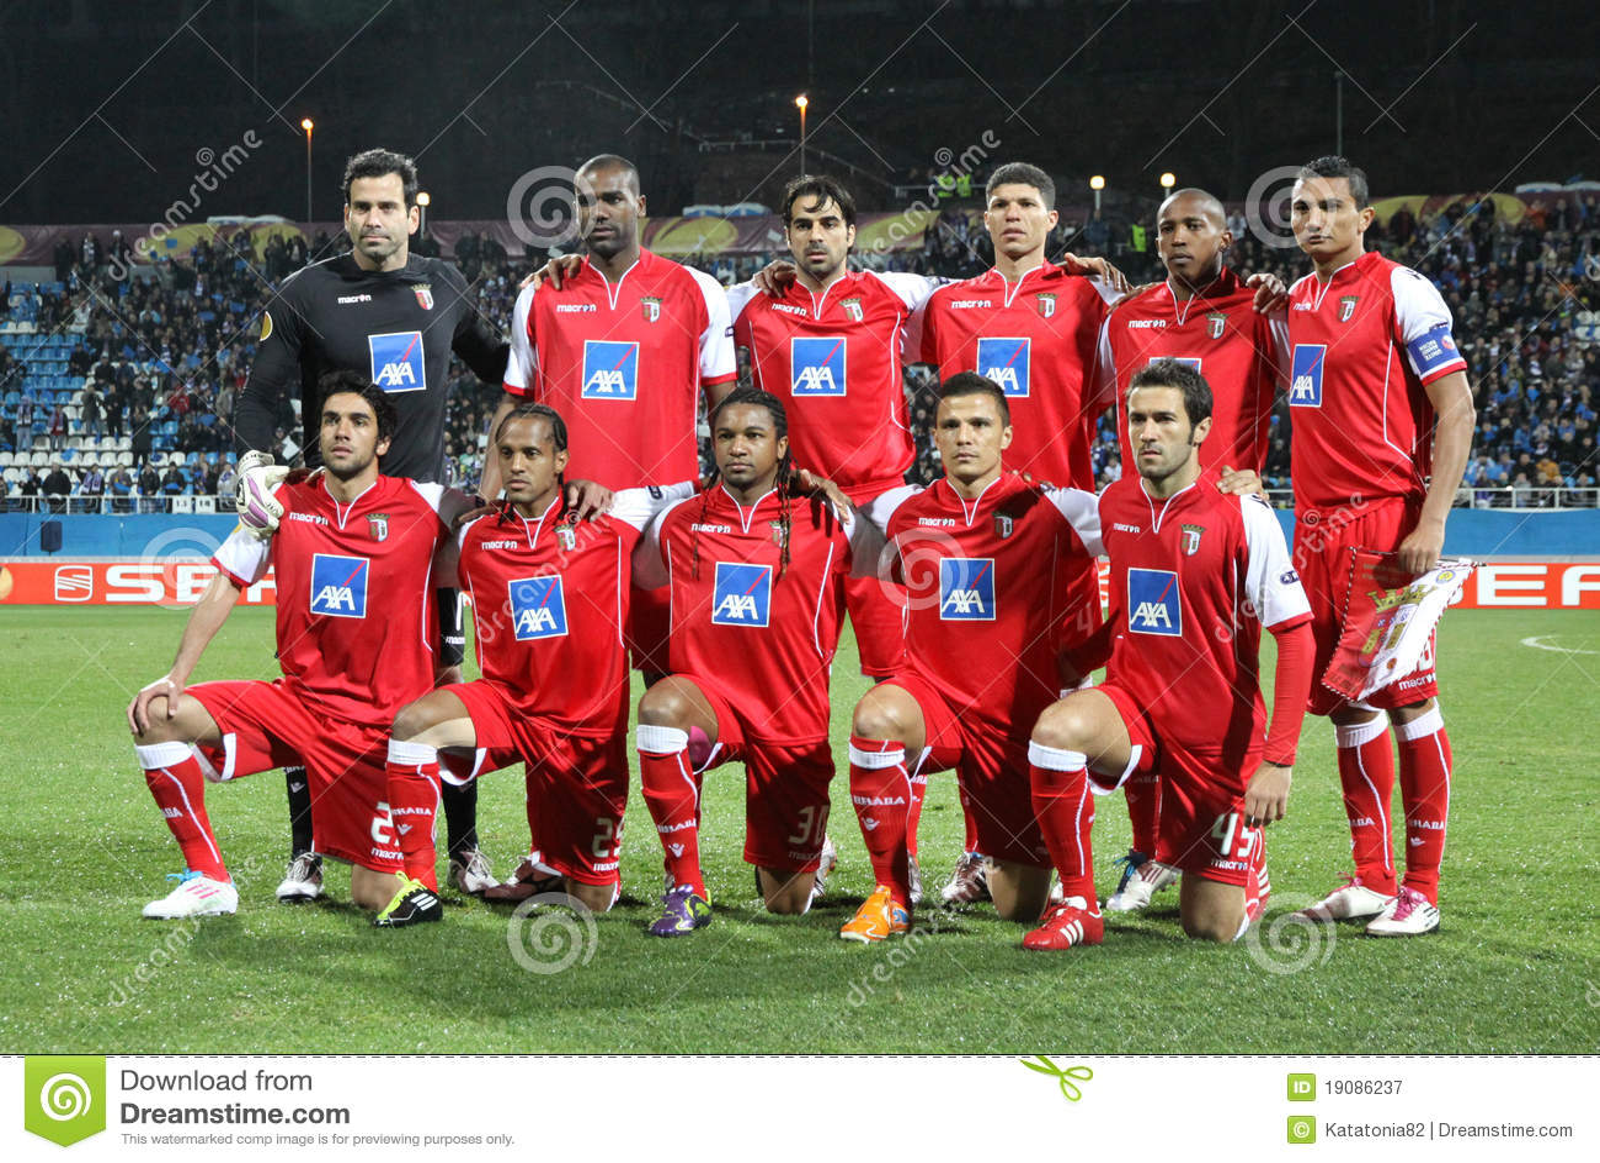 Braga Fc: SC Braga Team Pose For A Group Photo Editorial Photography